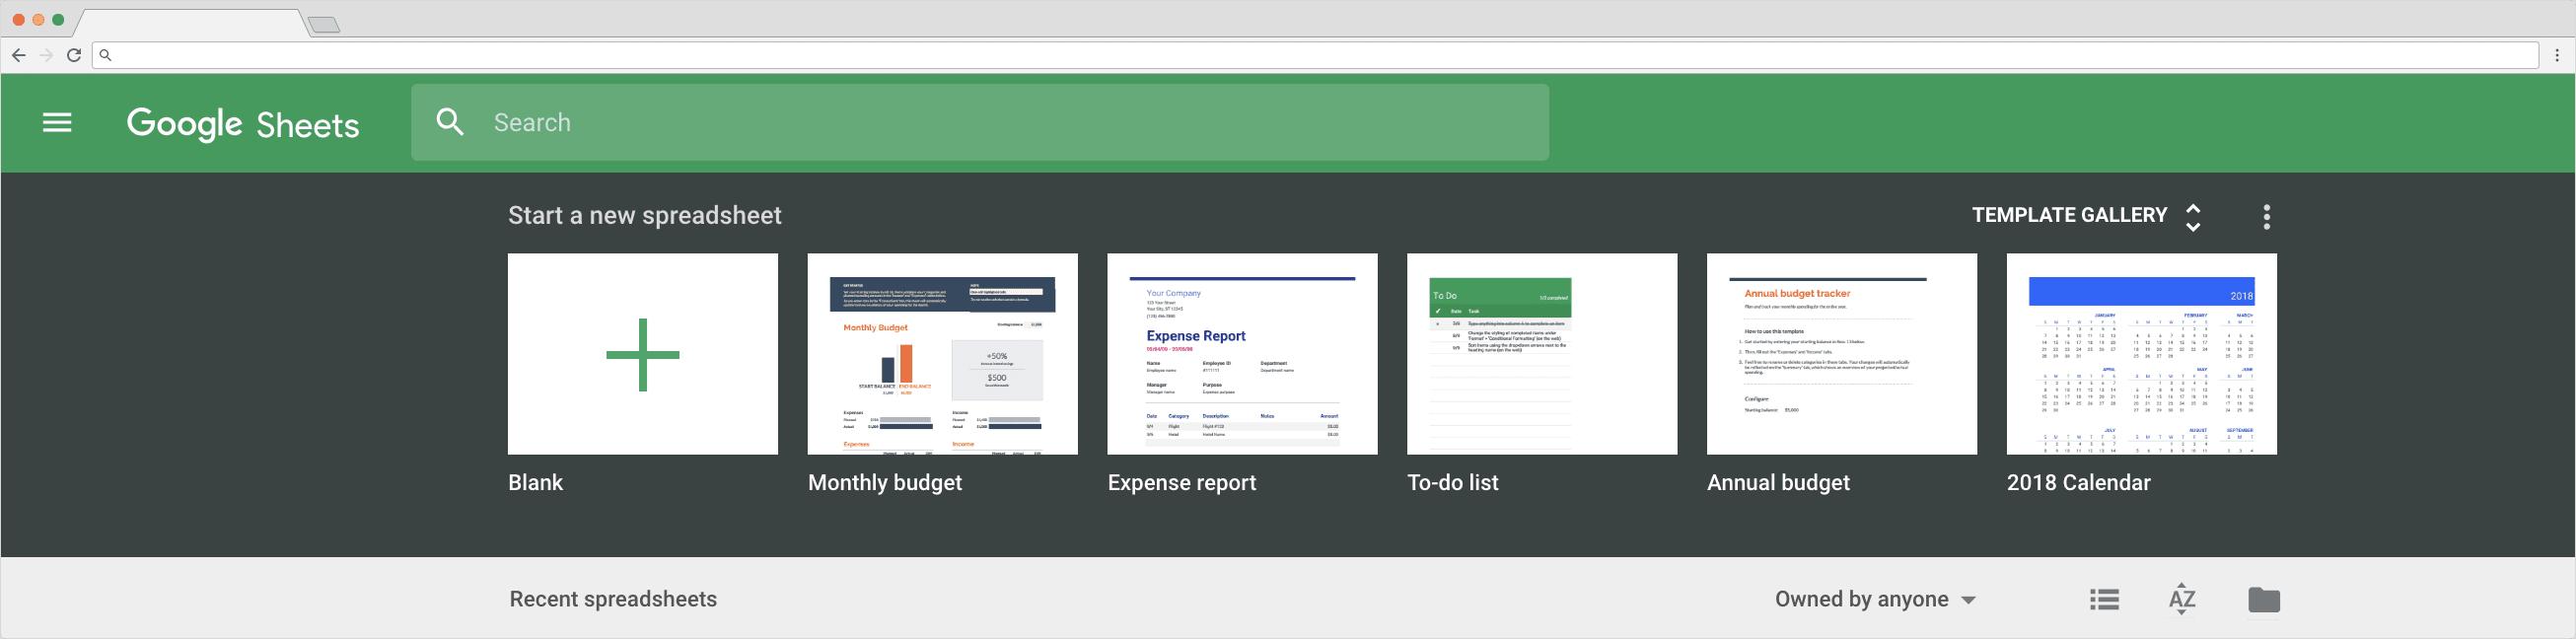 top 5 free google sheets inventory templates blog sheetgo